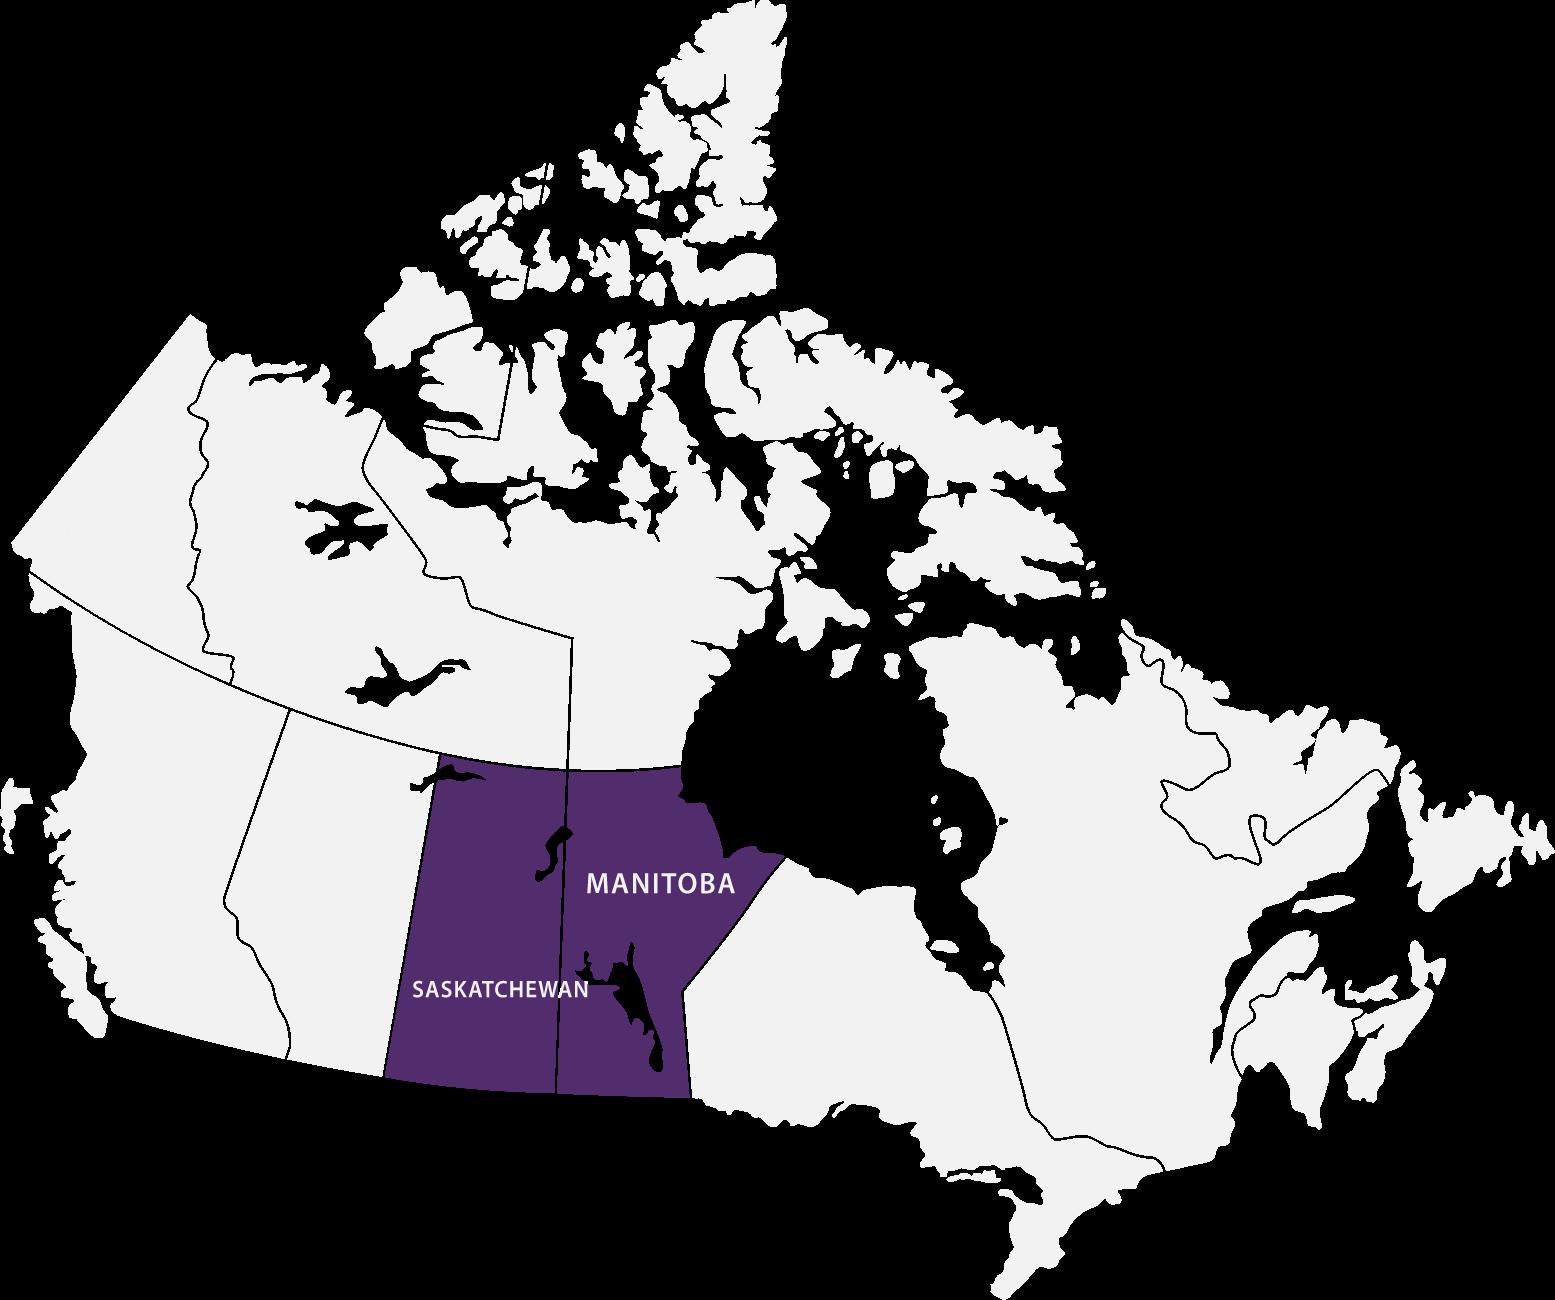 Manitoba and Saskatchewan Plans